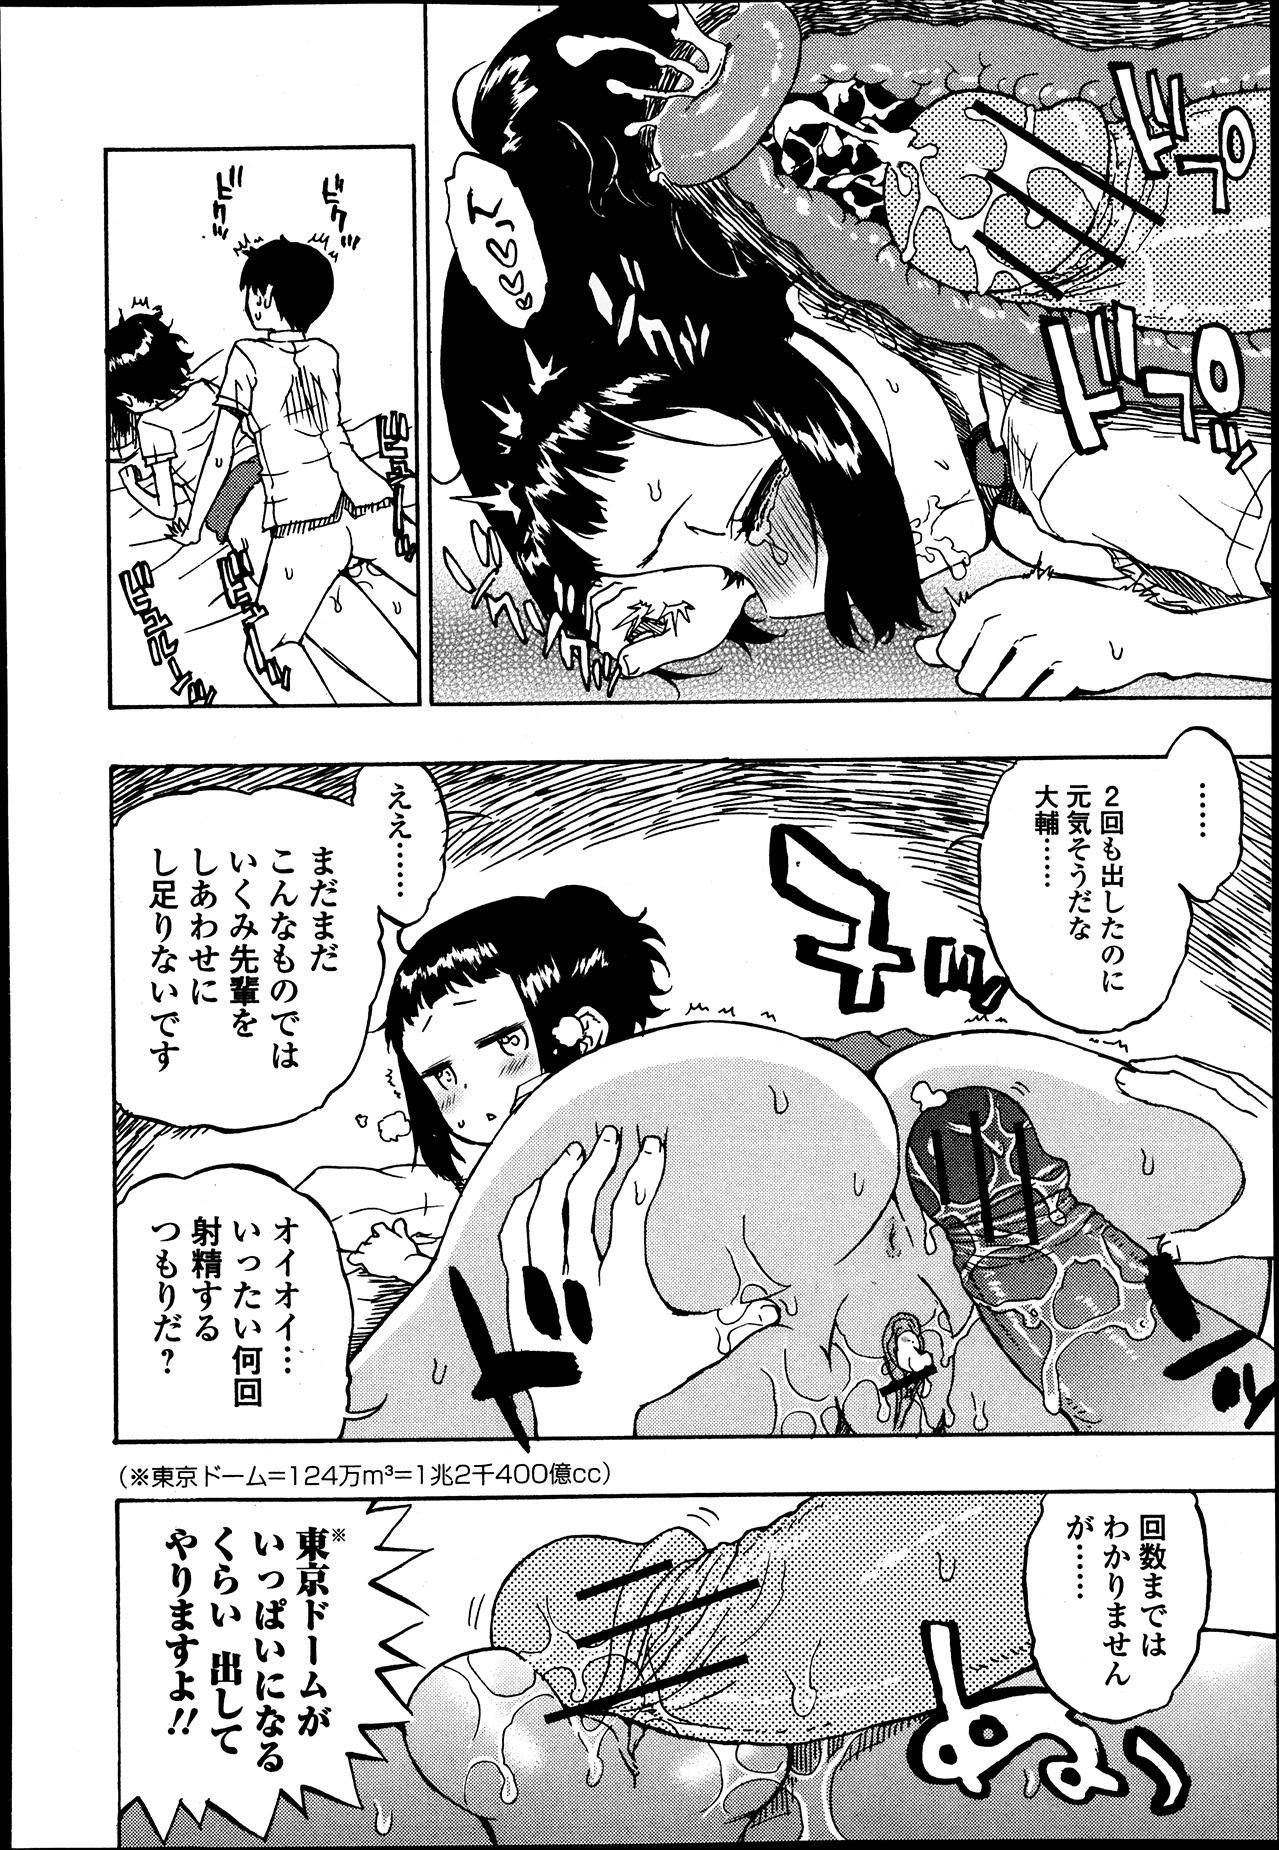 Bishoujo Kakumei KIWAME Road Vol.9 151